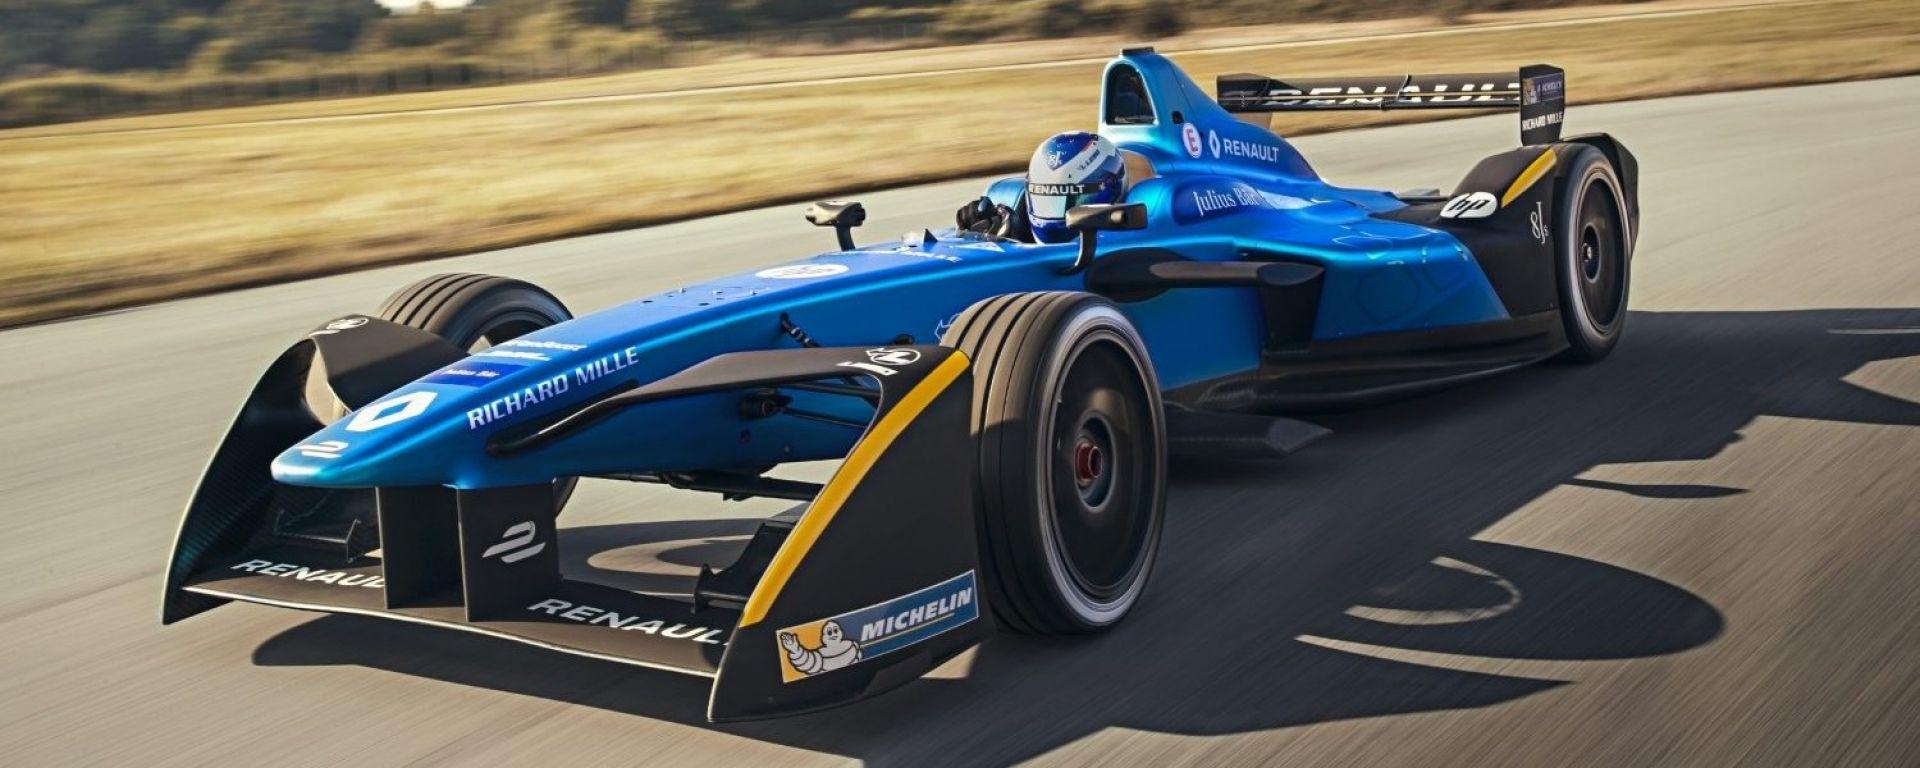 Renault-e.dams - Renault